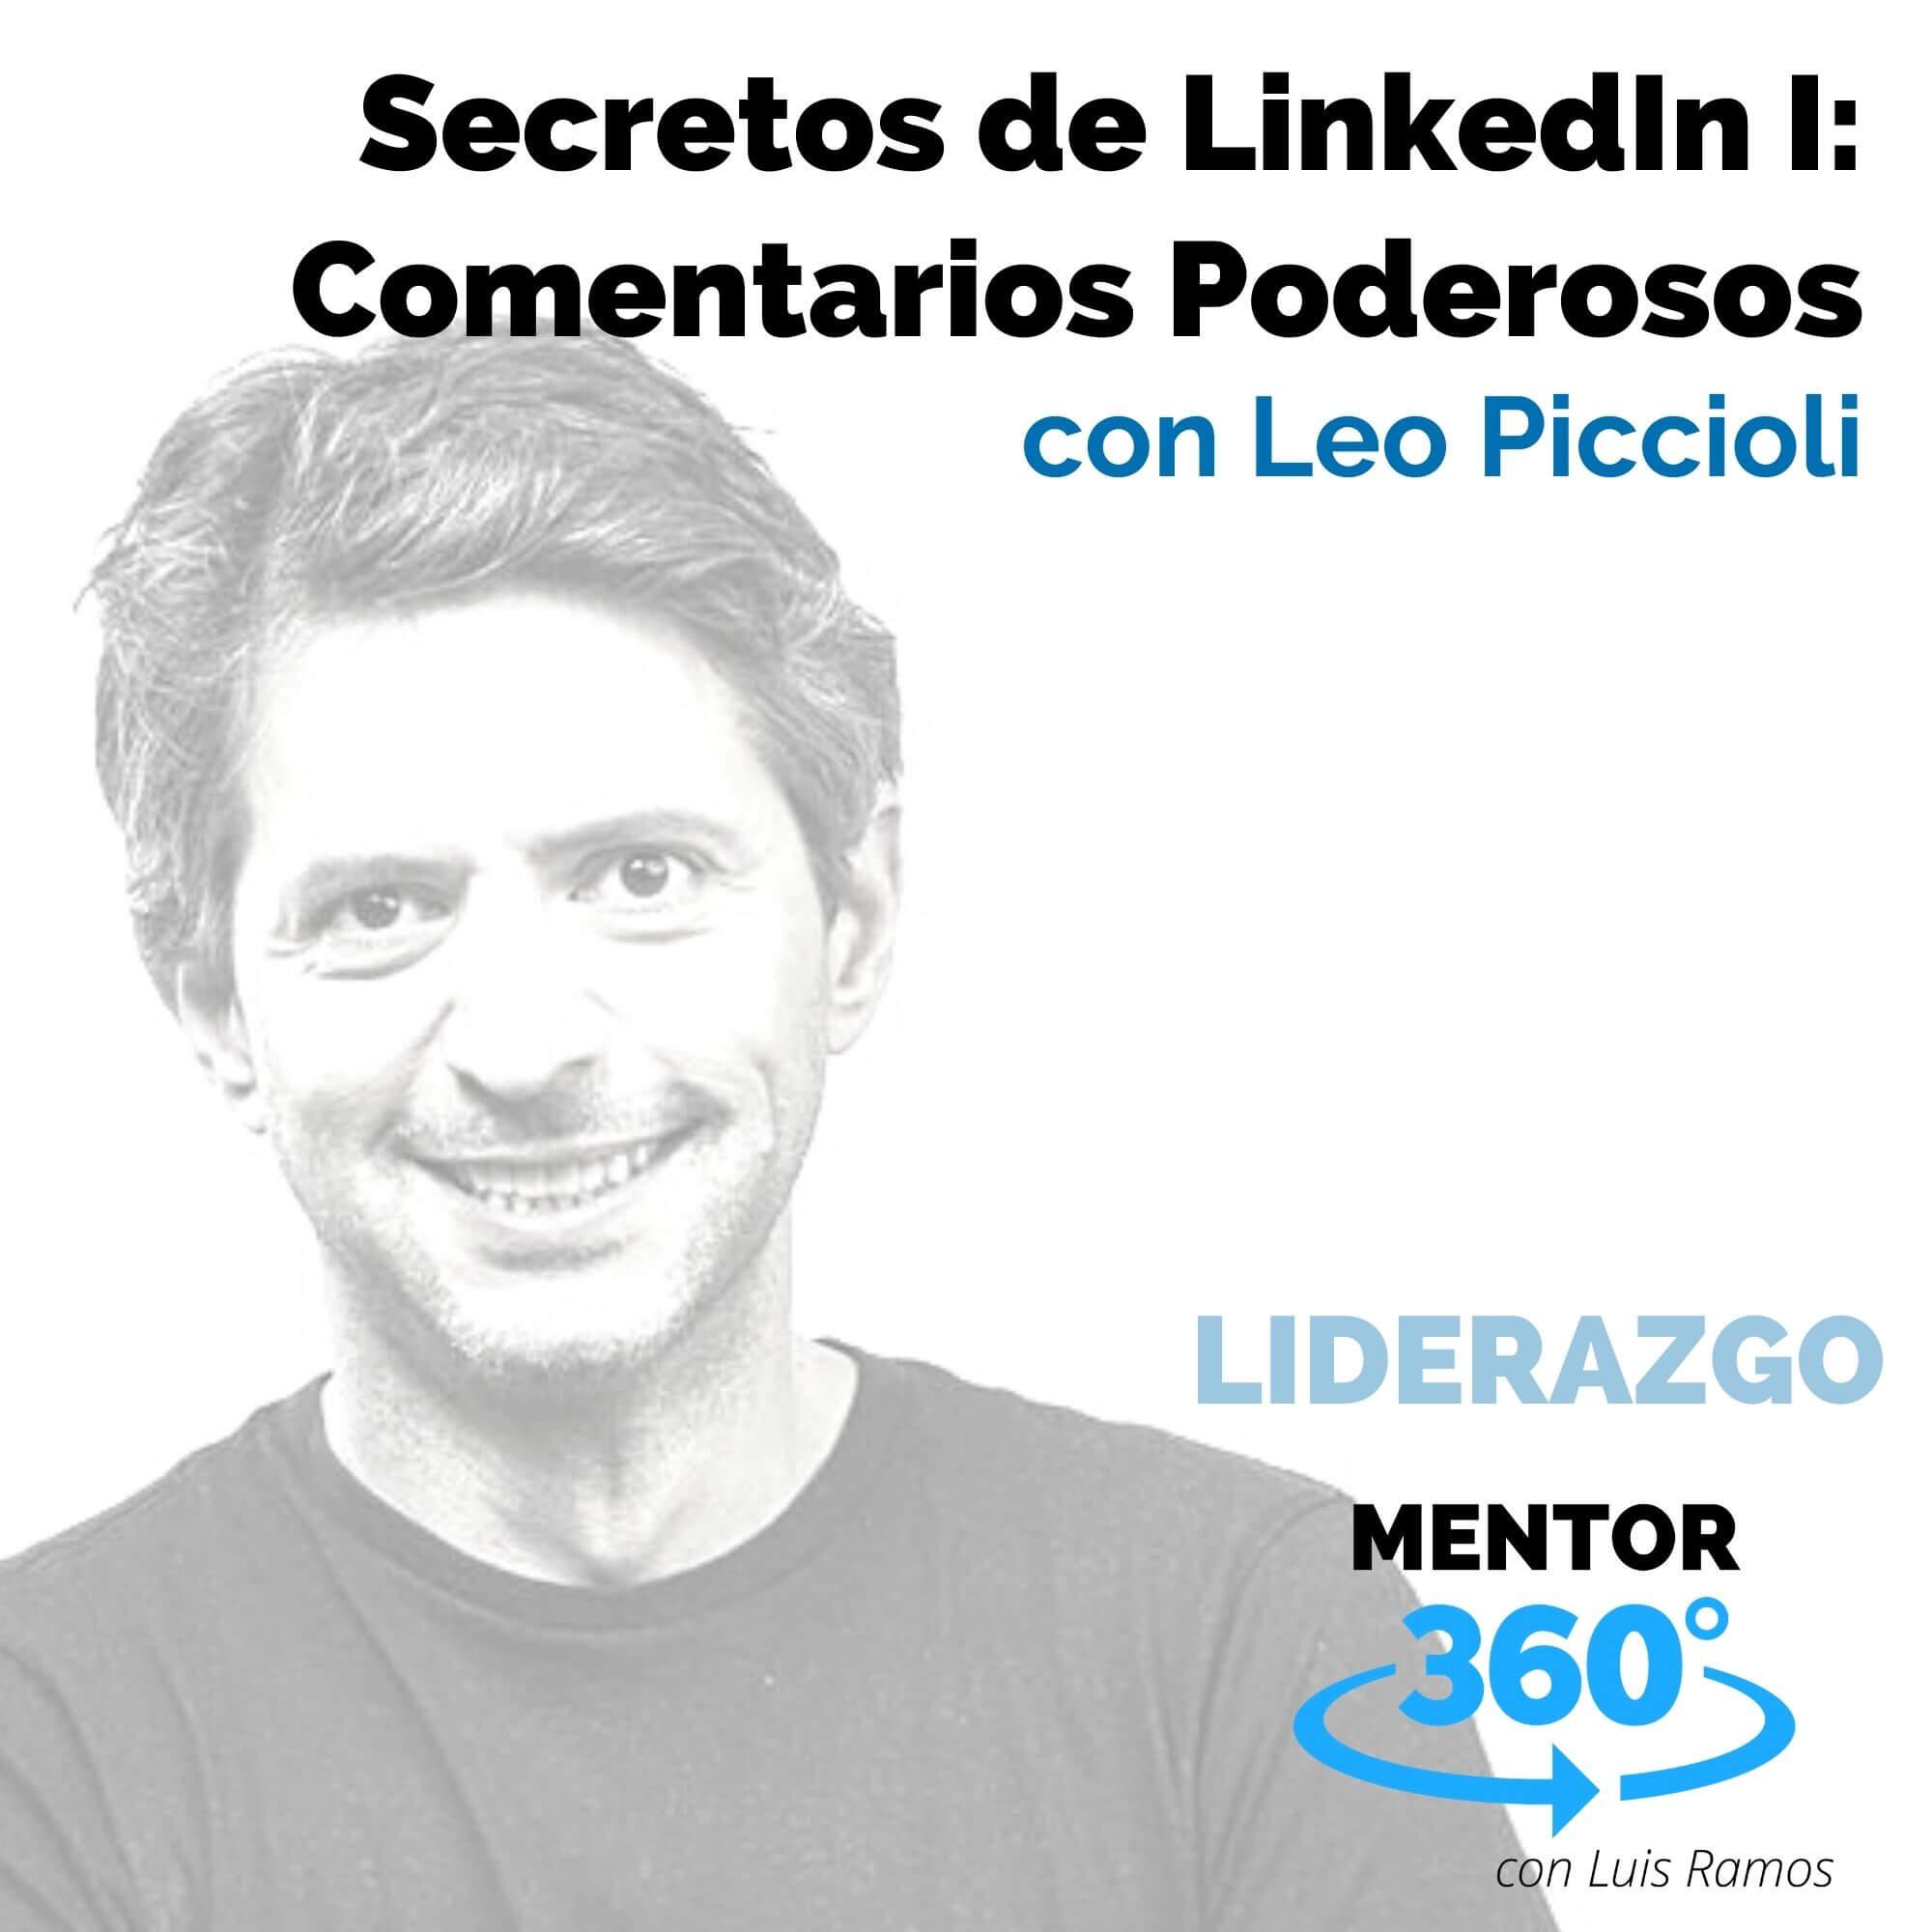 Secretos de LinkedIn 1 - Comentarios Poderosos, con Leo Piccioli - MENTOR360